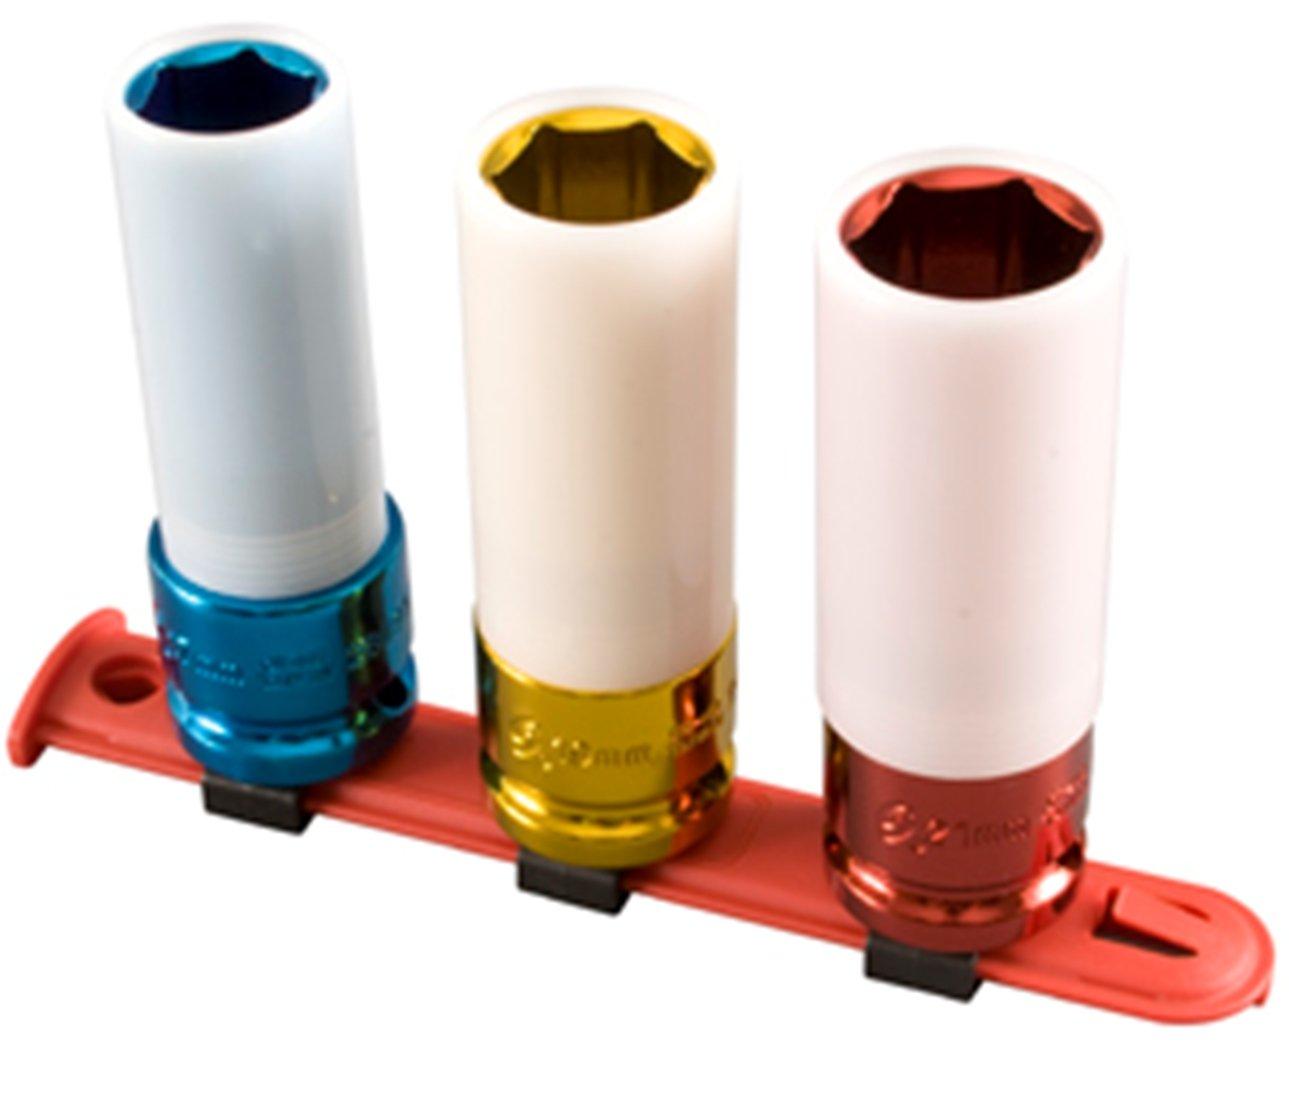 Sunex 2842 1/2' Drive Metric Extra Thin Wall Deep Wheel Protector Impact Socket Set, 3-Piece